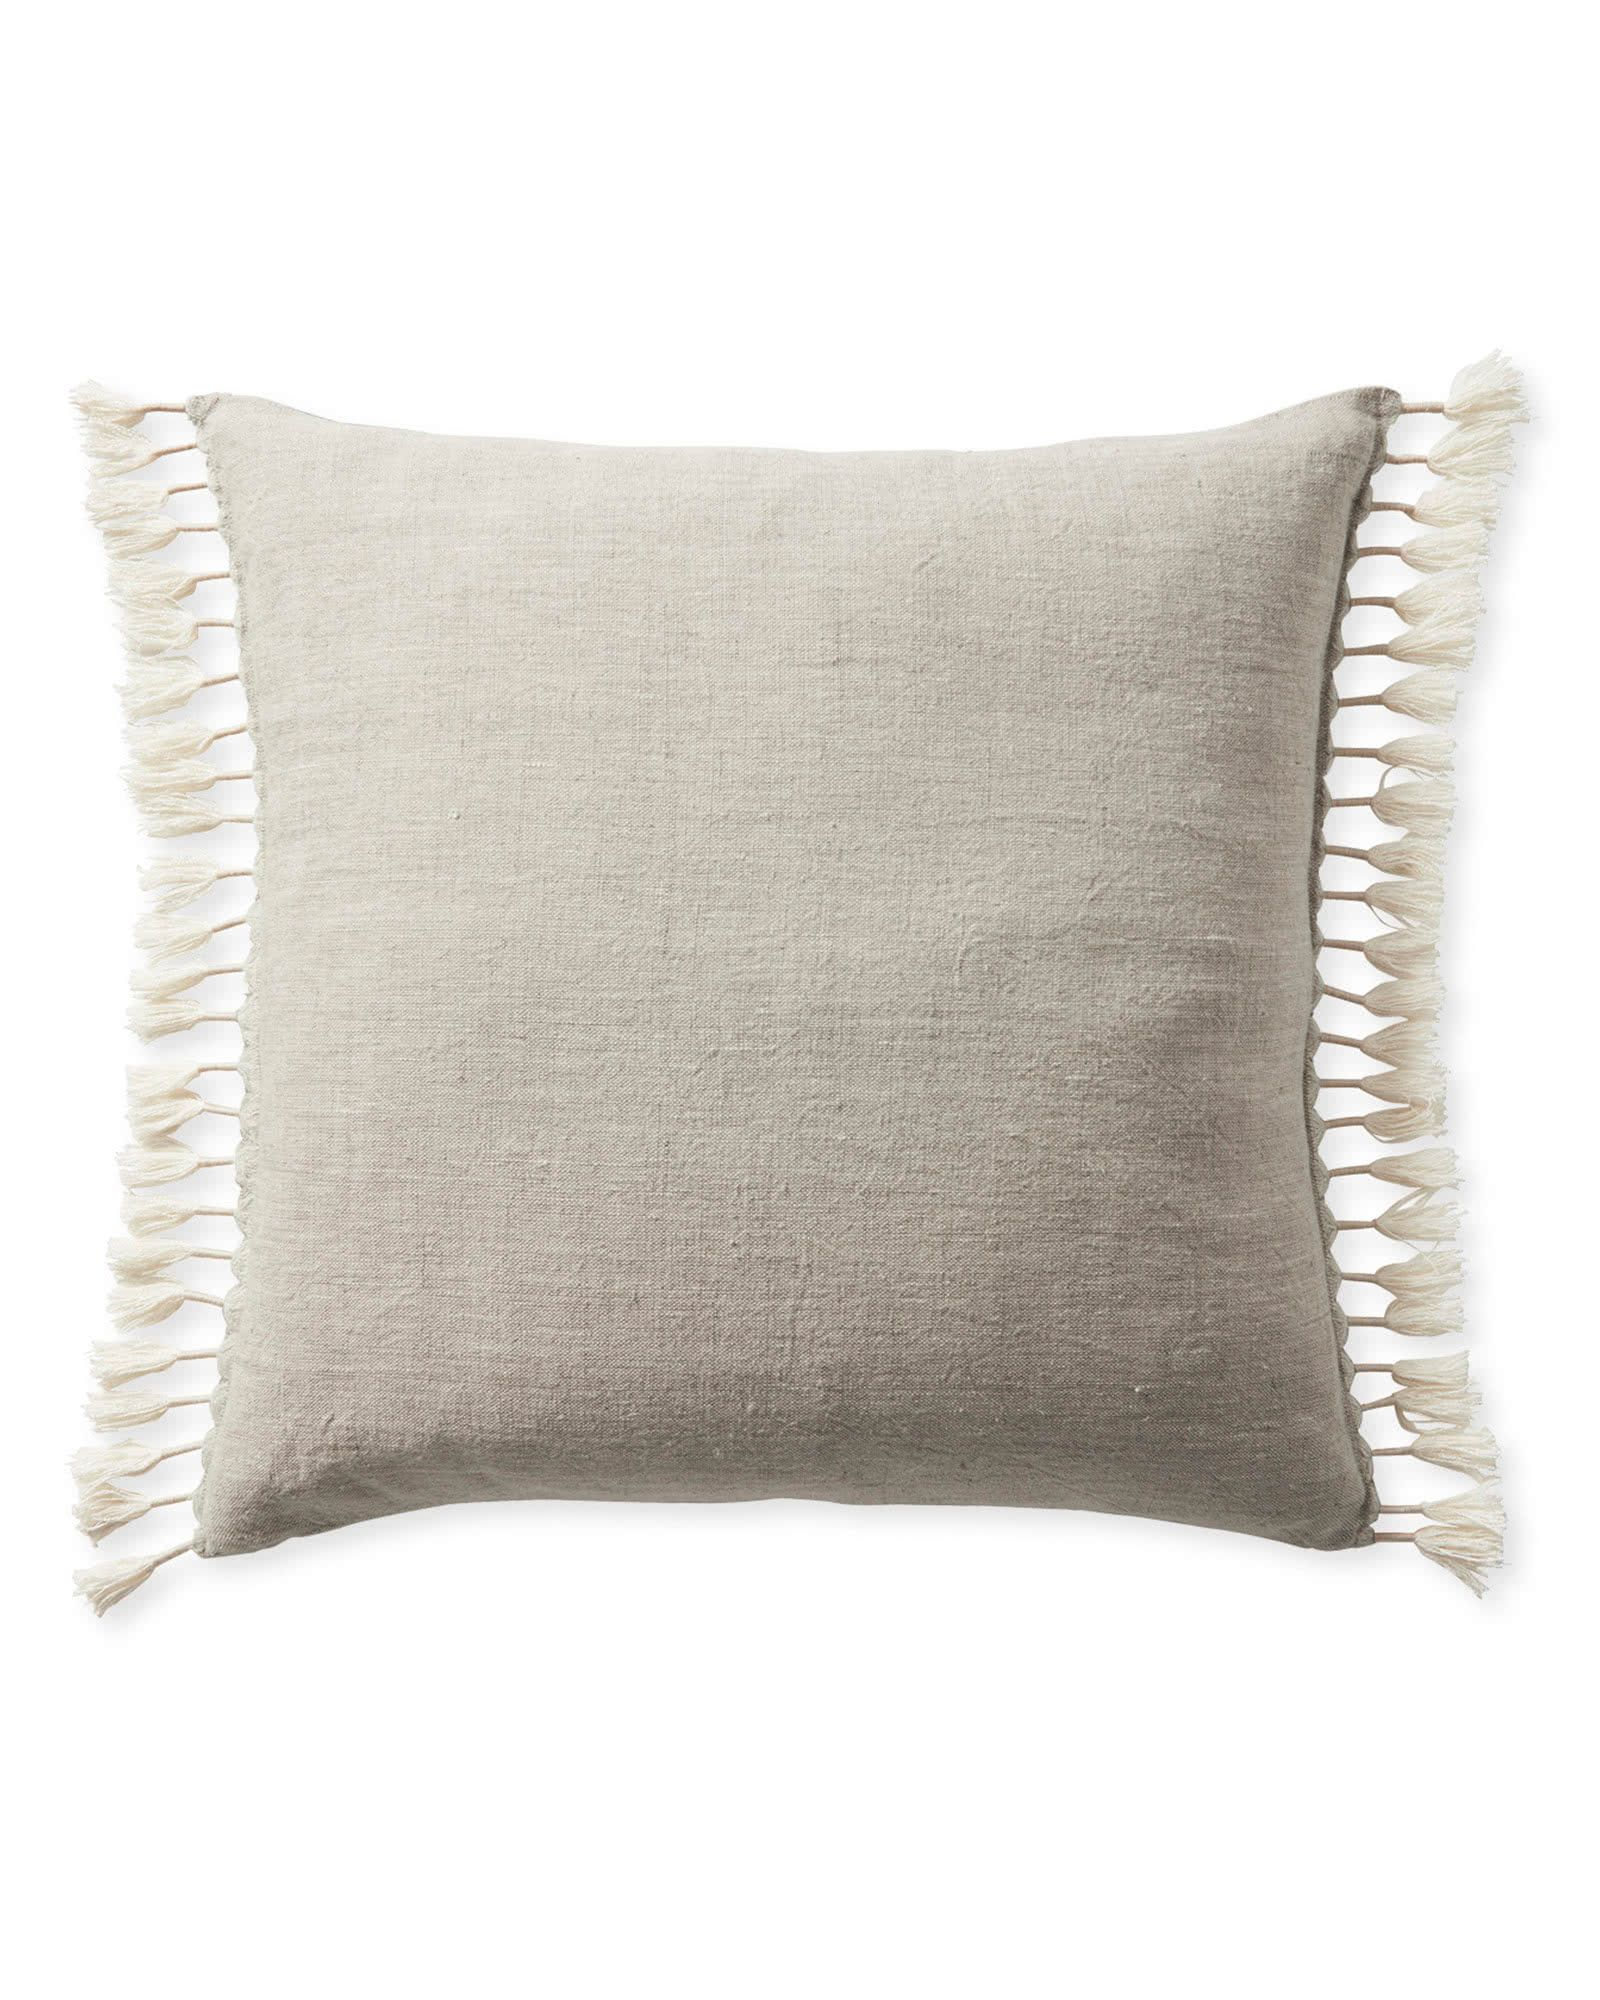 Topanga Pillow Cover Serena, lily wallpaper, Pillows